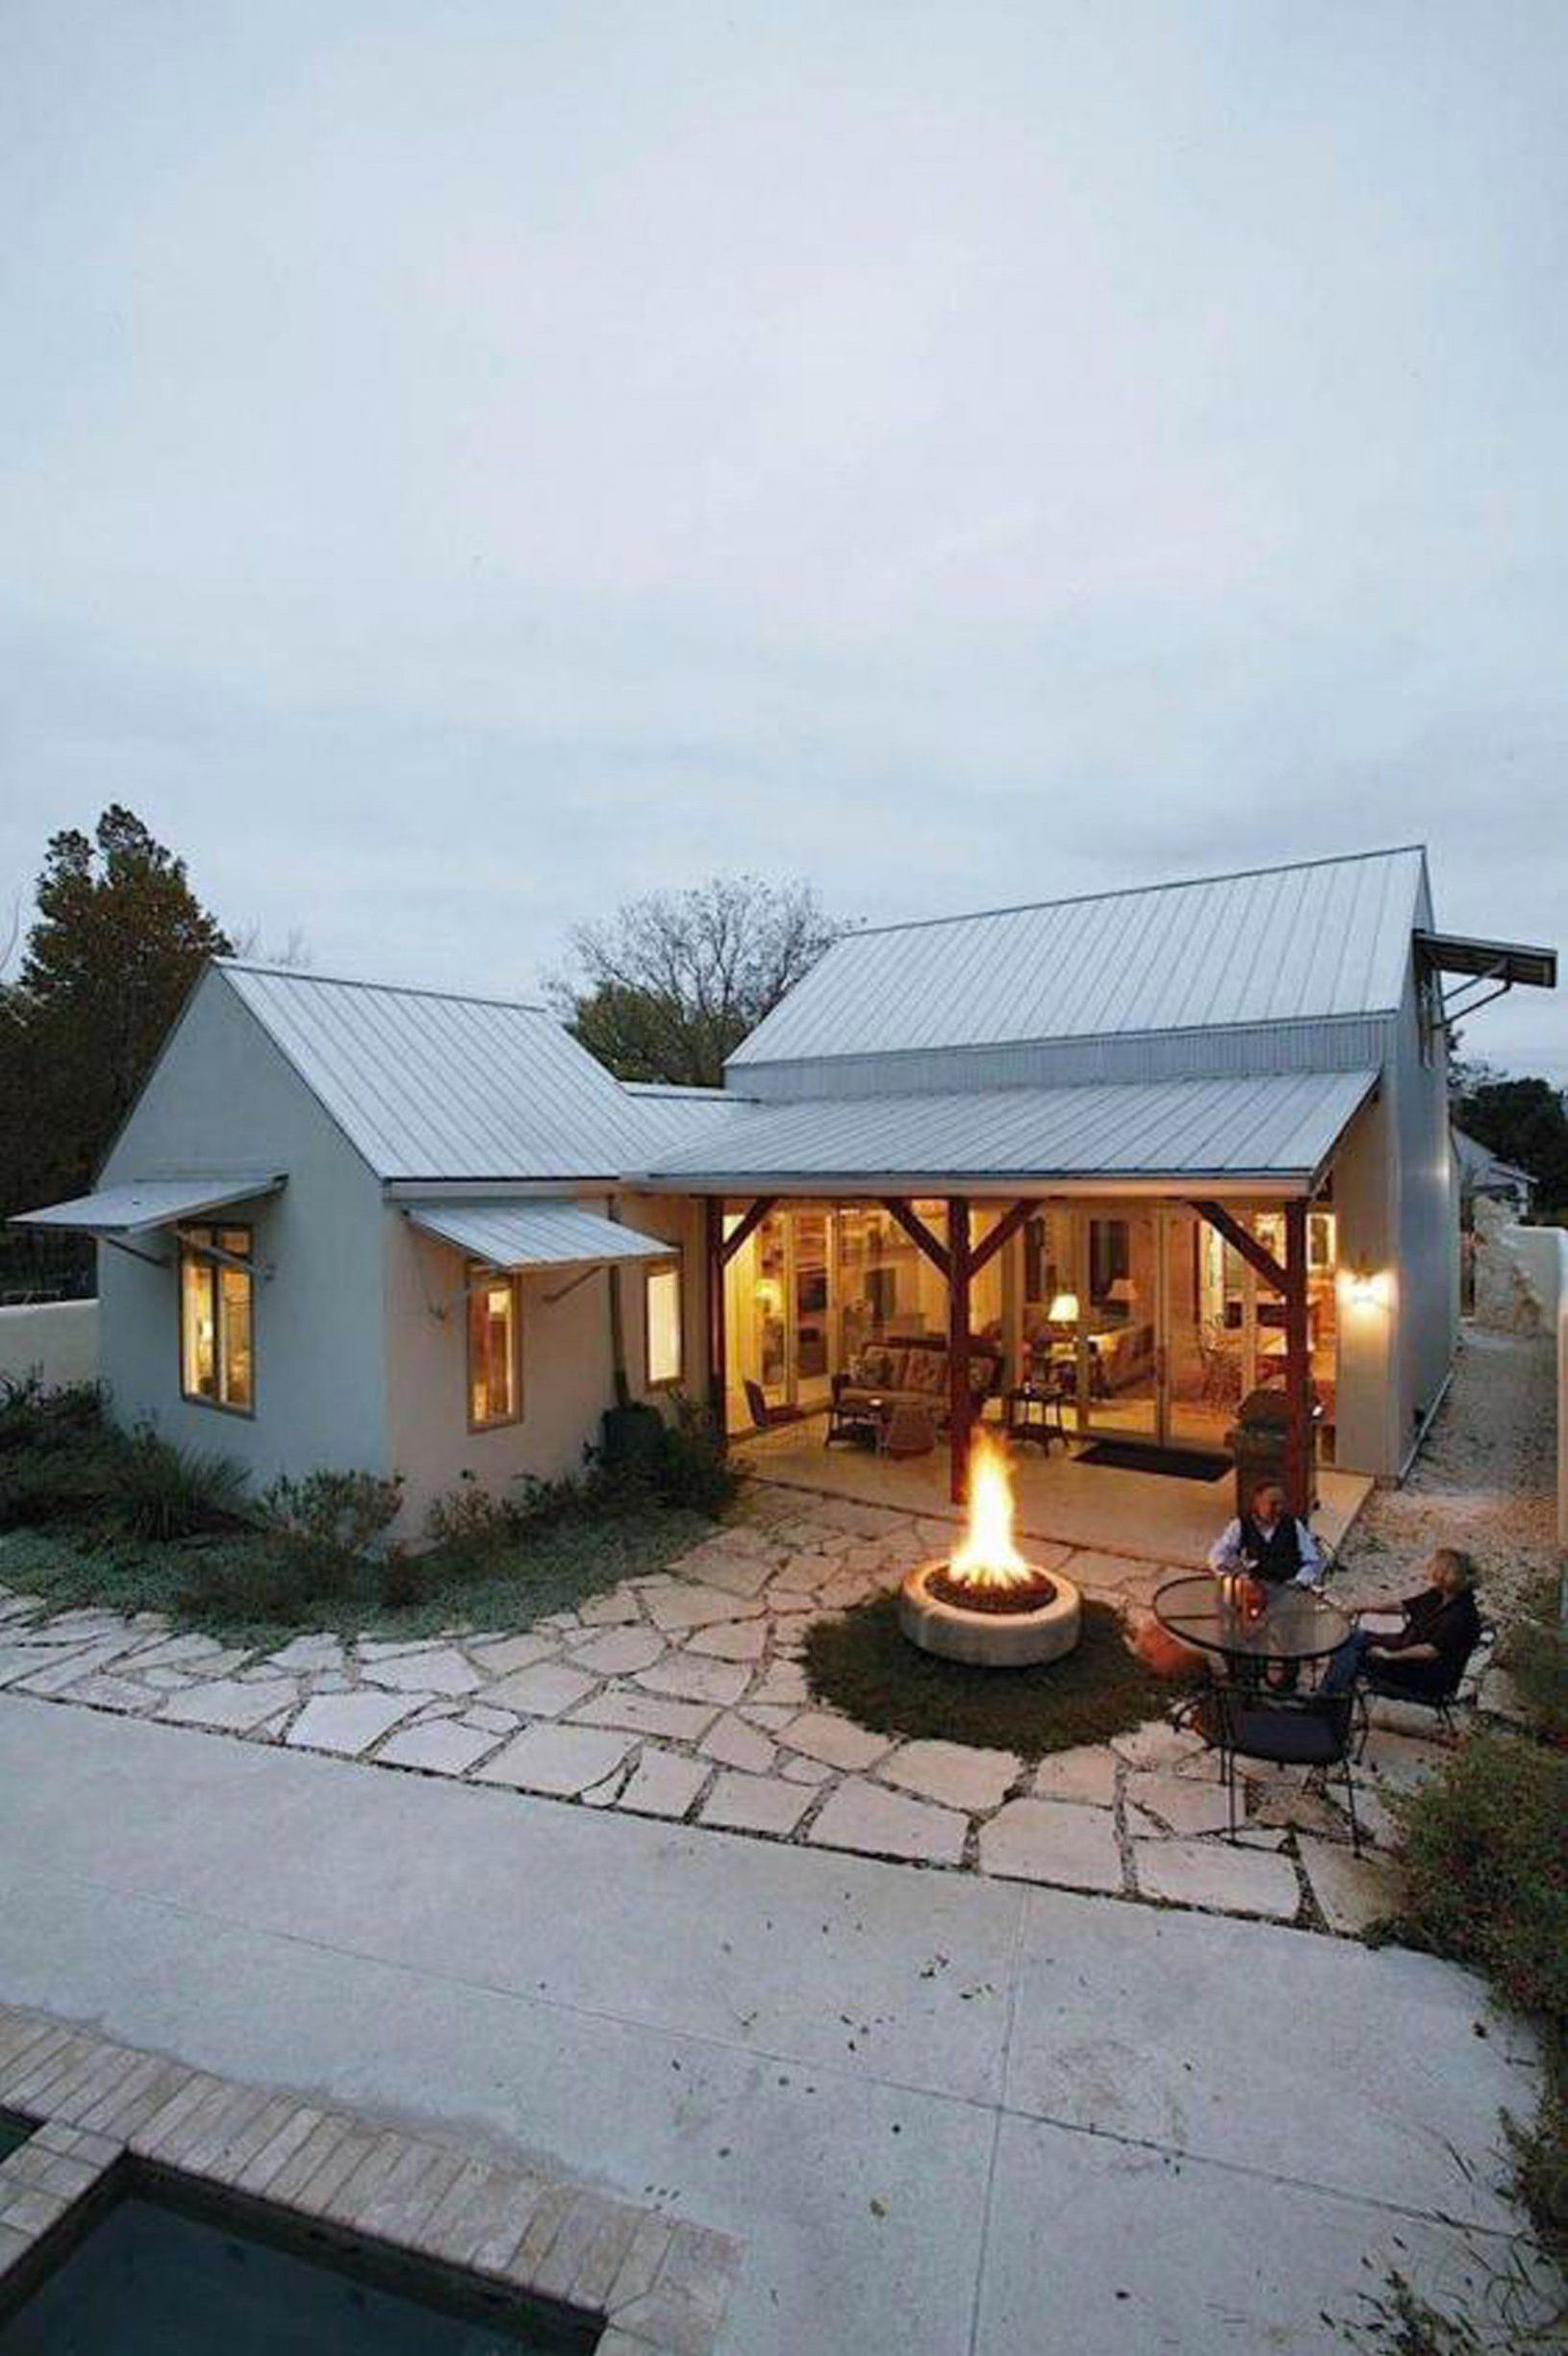 21 Stunning Modern Exterior Design Ideas: 9 Stunning Modern Farmhouse Exterior Design Ideas